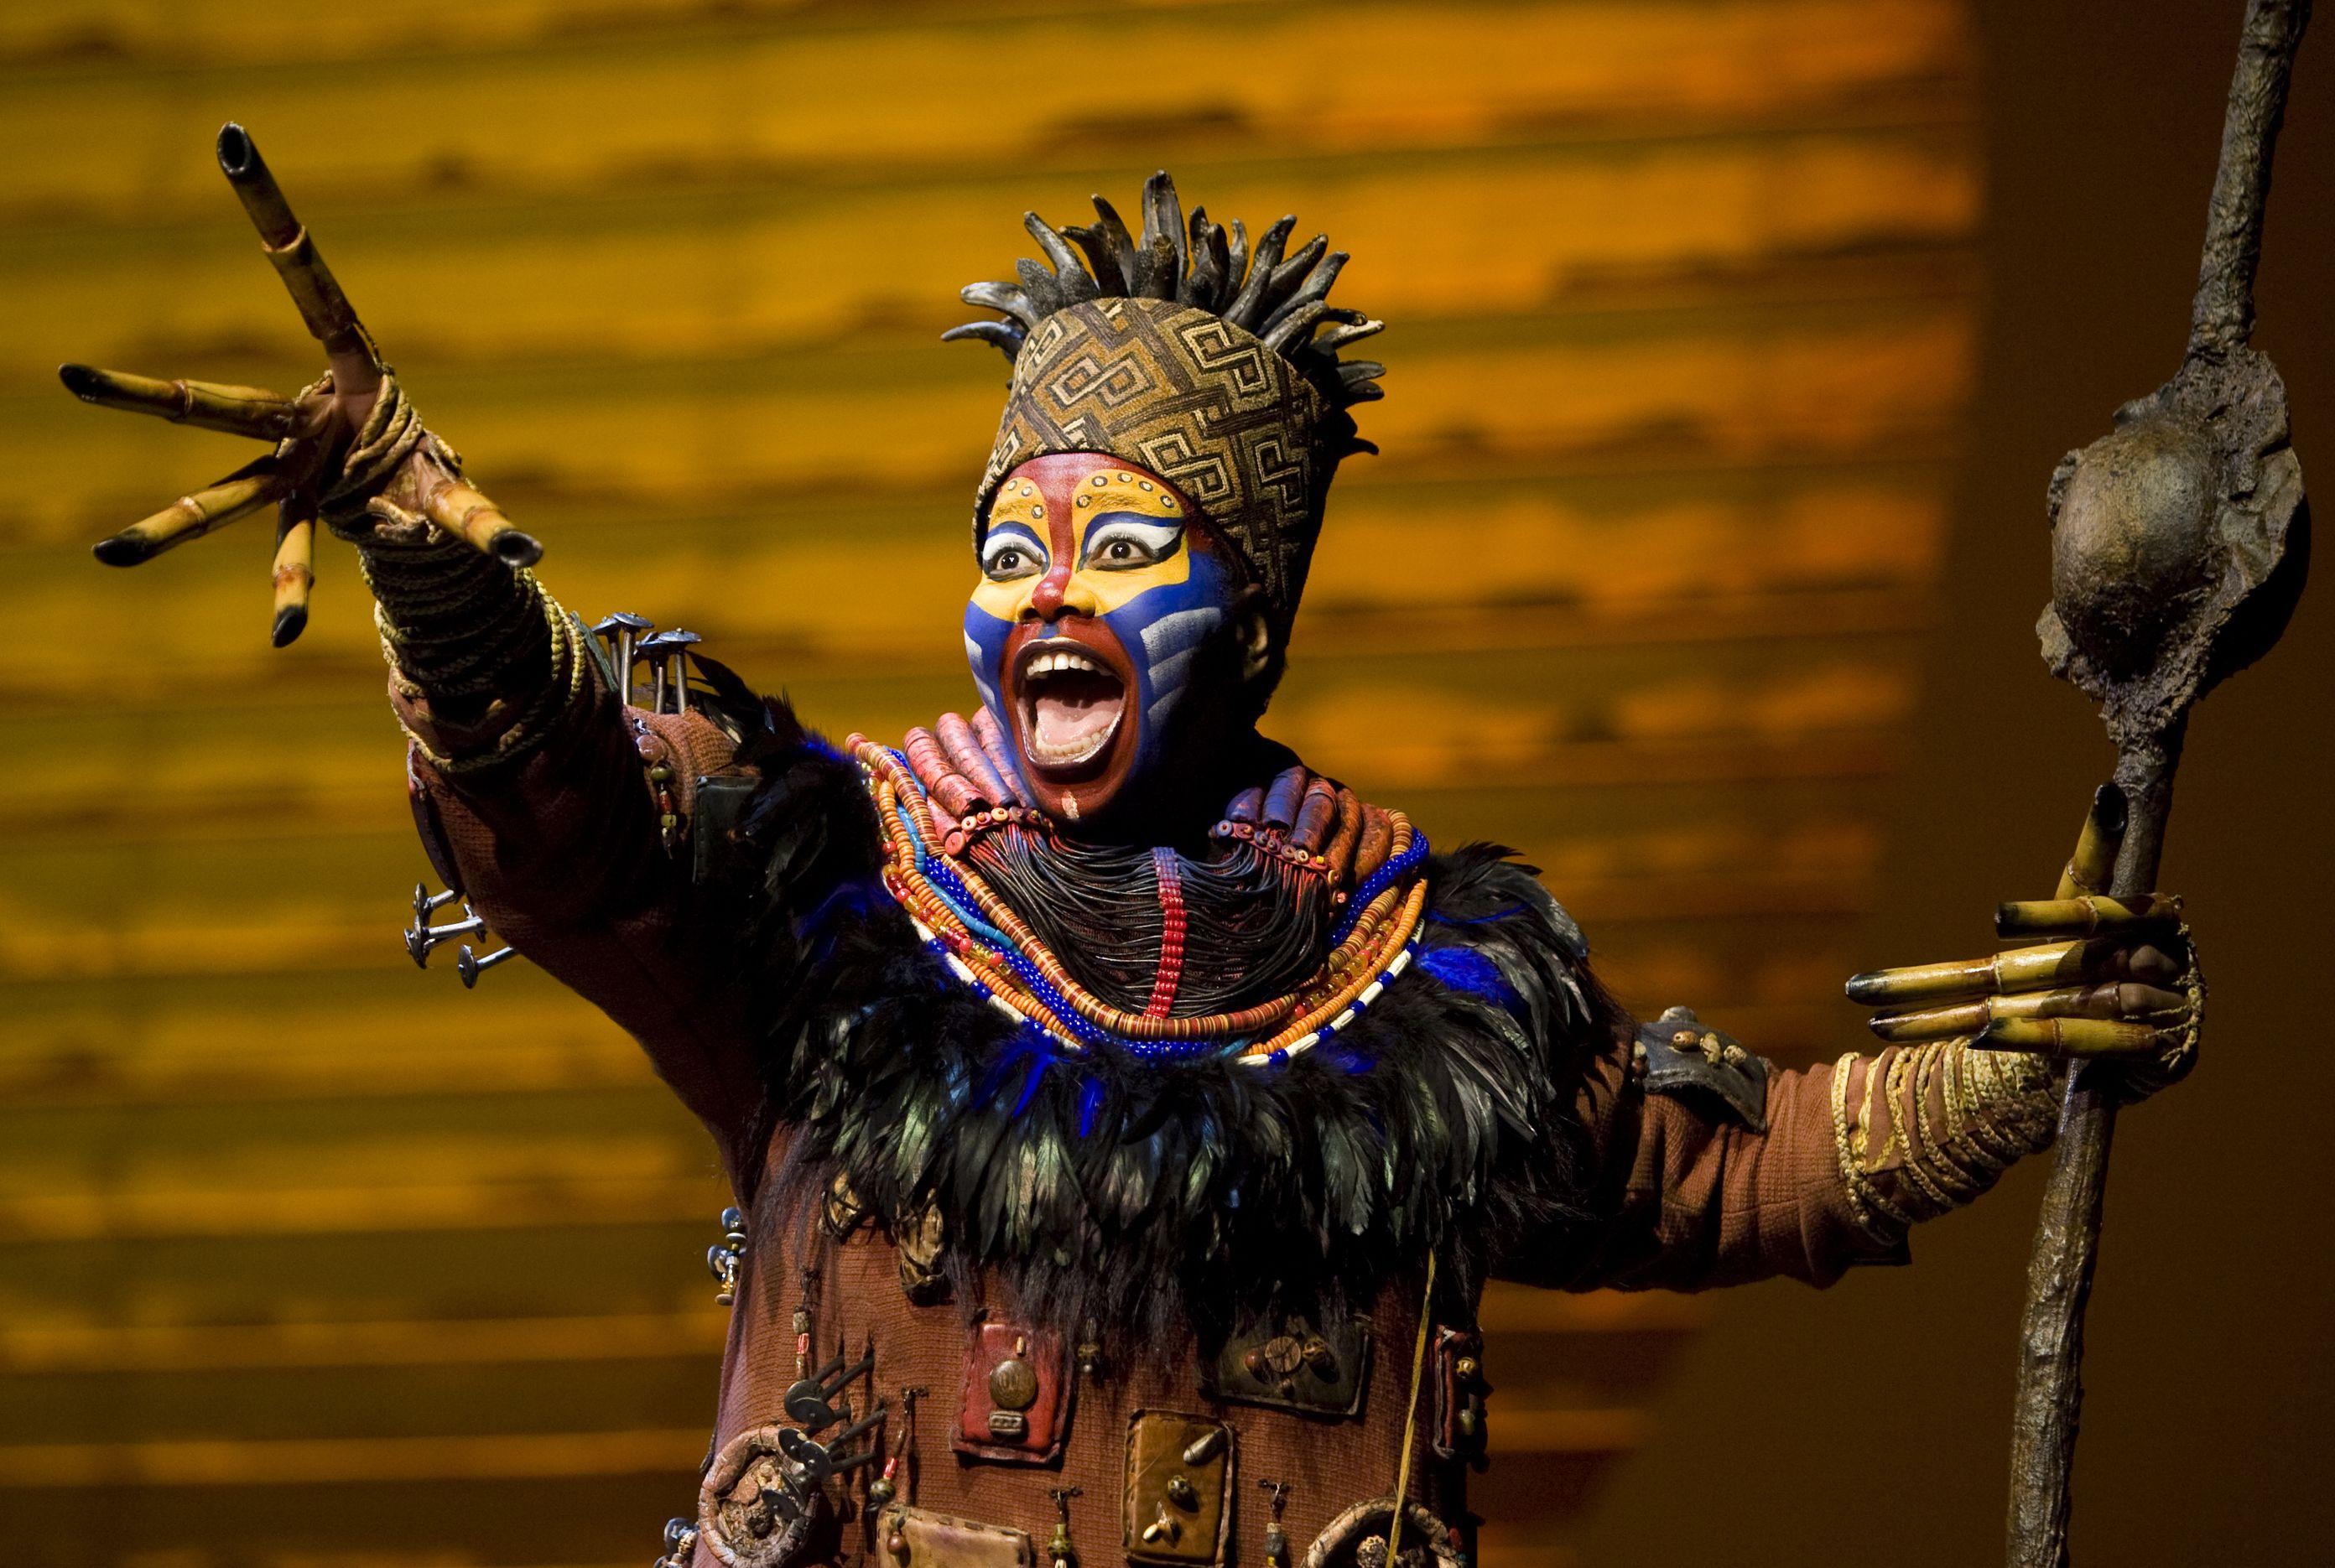 Resultado de imagen para lion king musical